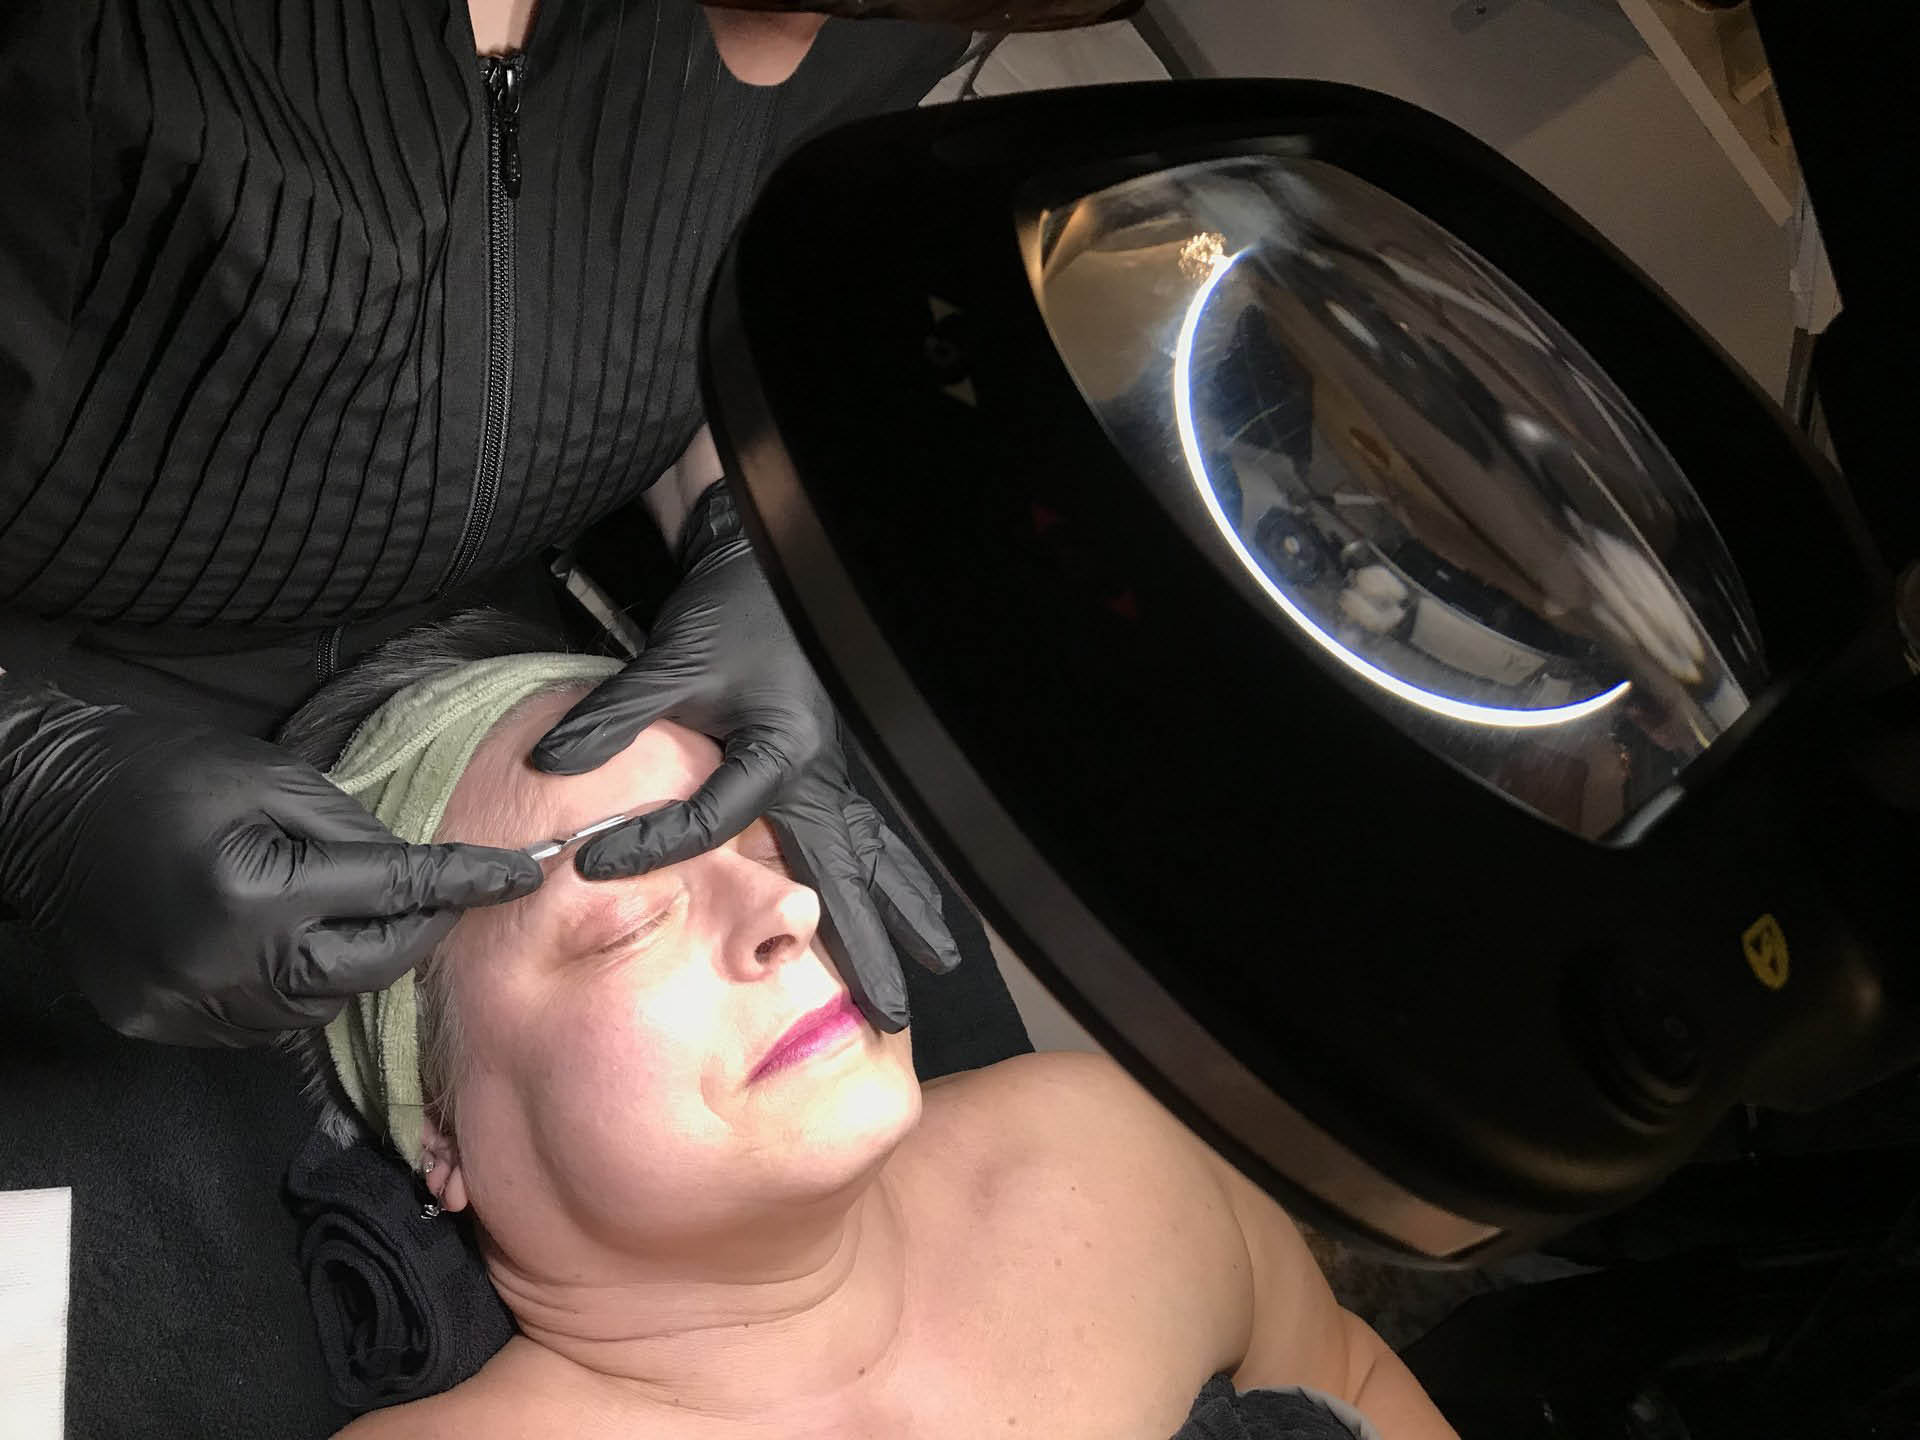 KLS Esthetics - Microblading Brows - Last Lift - Lash Tint - Brow Tint - Auburn, WA - Lakeland Hills, WA - Facial Near Me - Skin Care Near Me